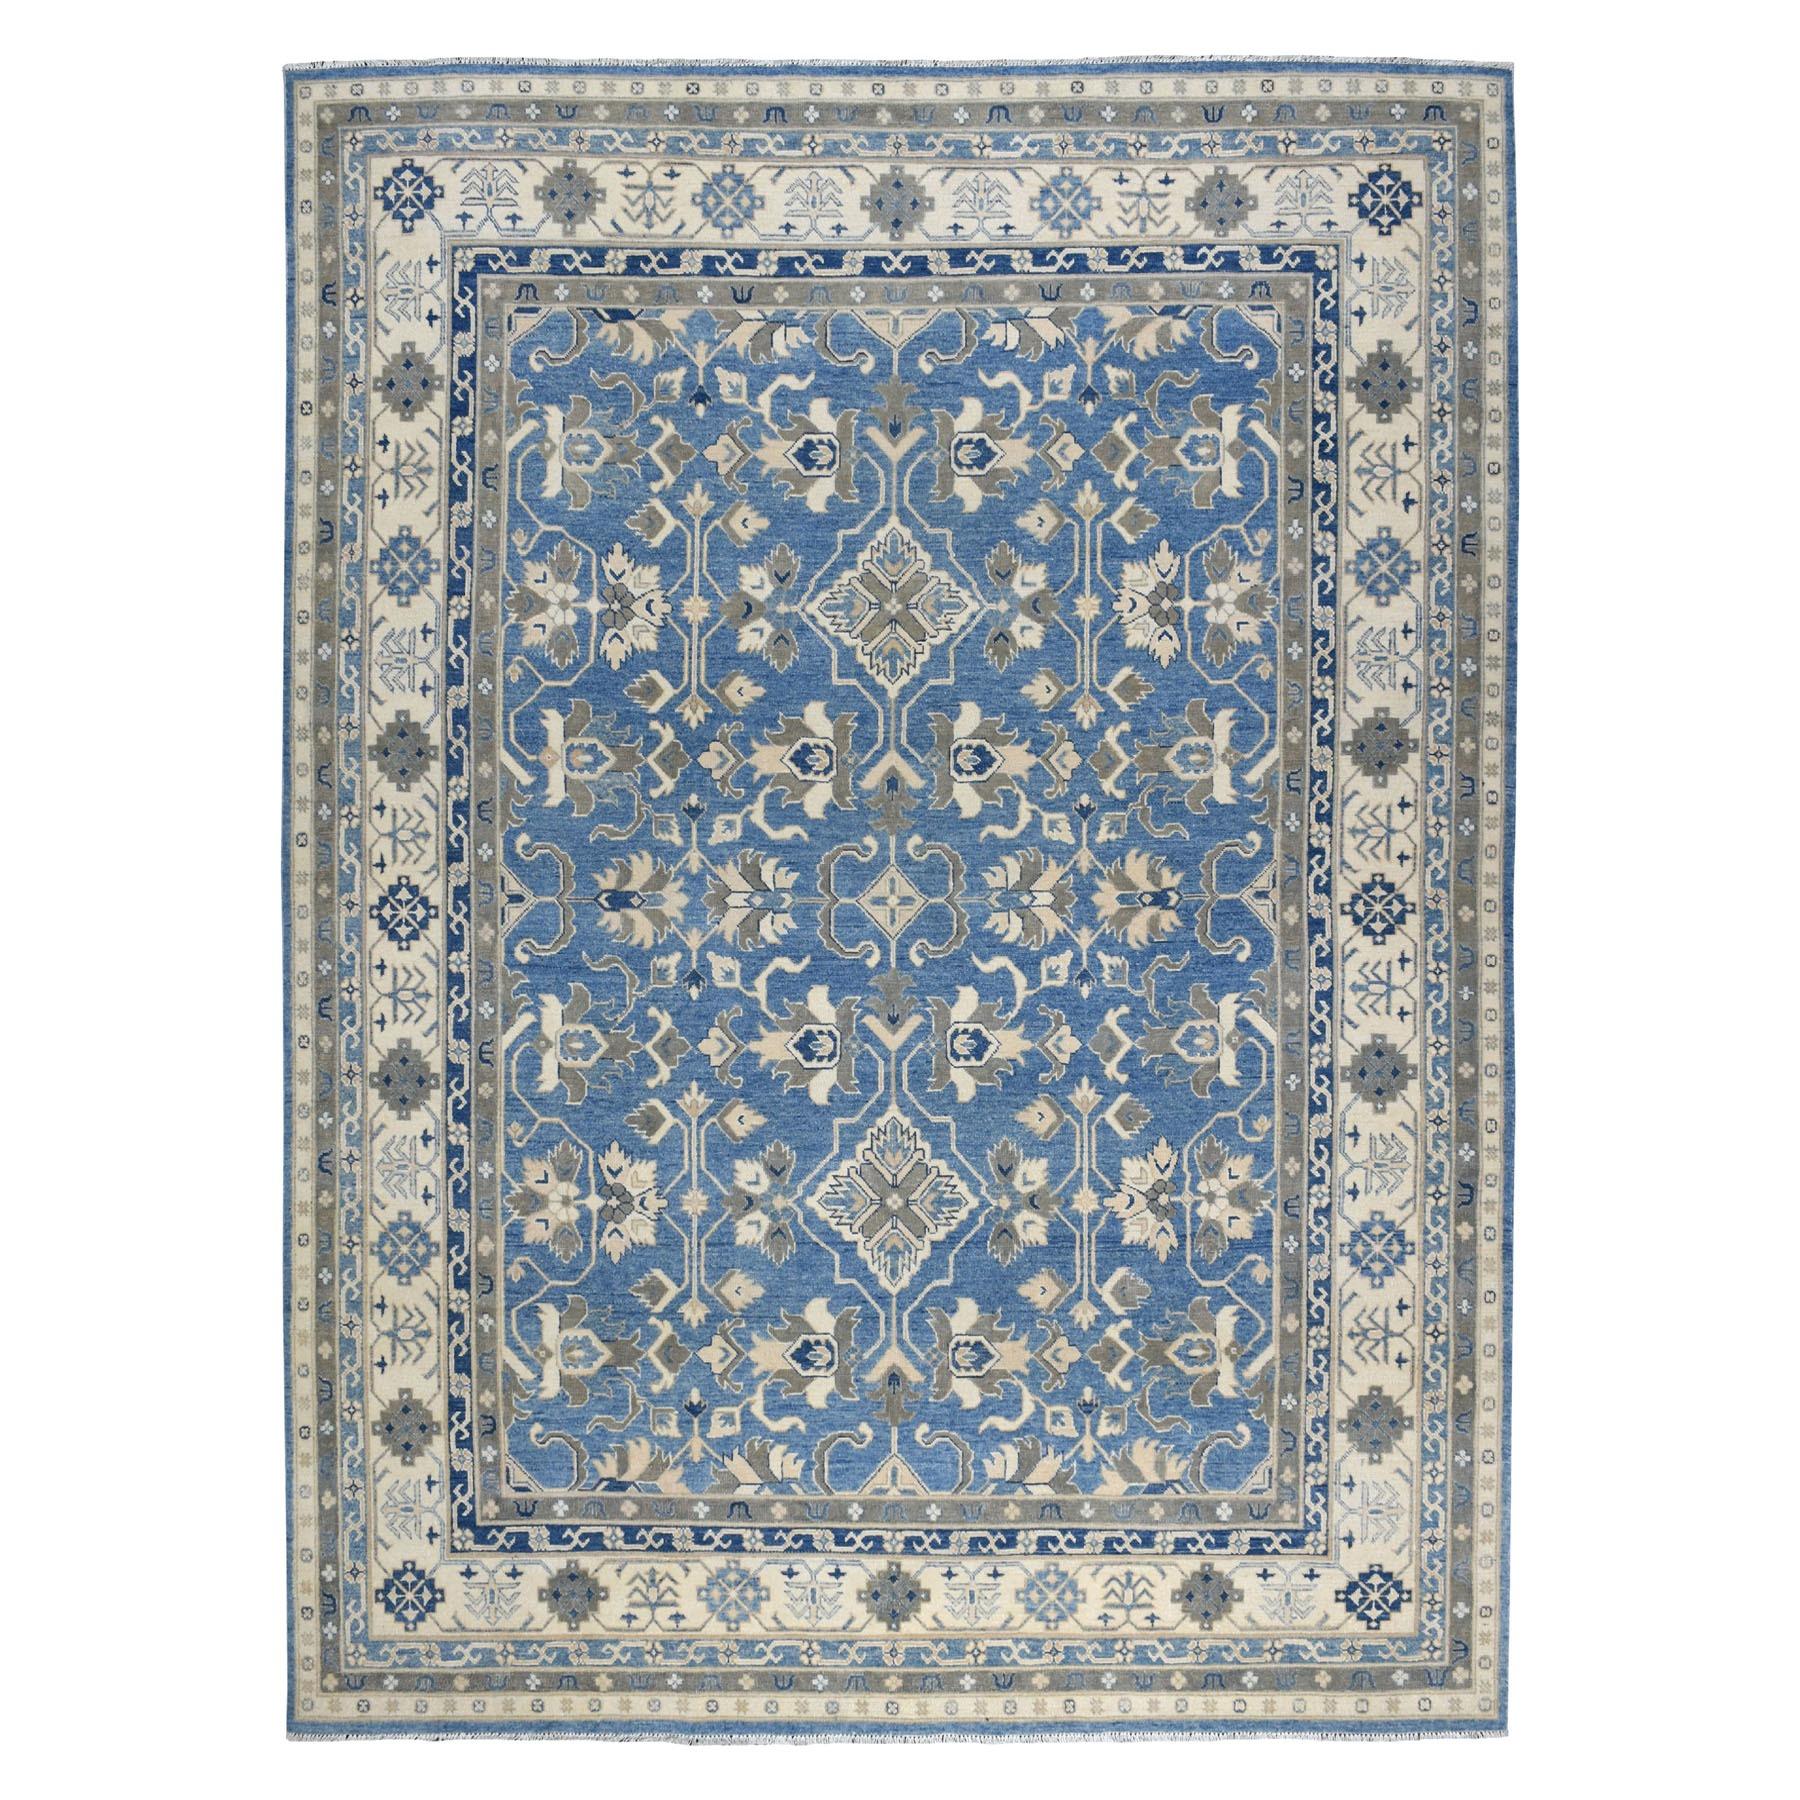 "9'x11'8"" Blue Vintage Look Kazak Organic Wool Hand Knotted Oriental Rug 54596"